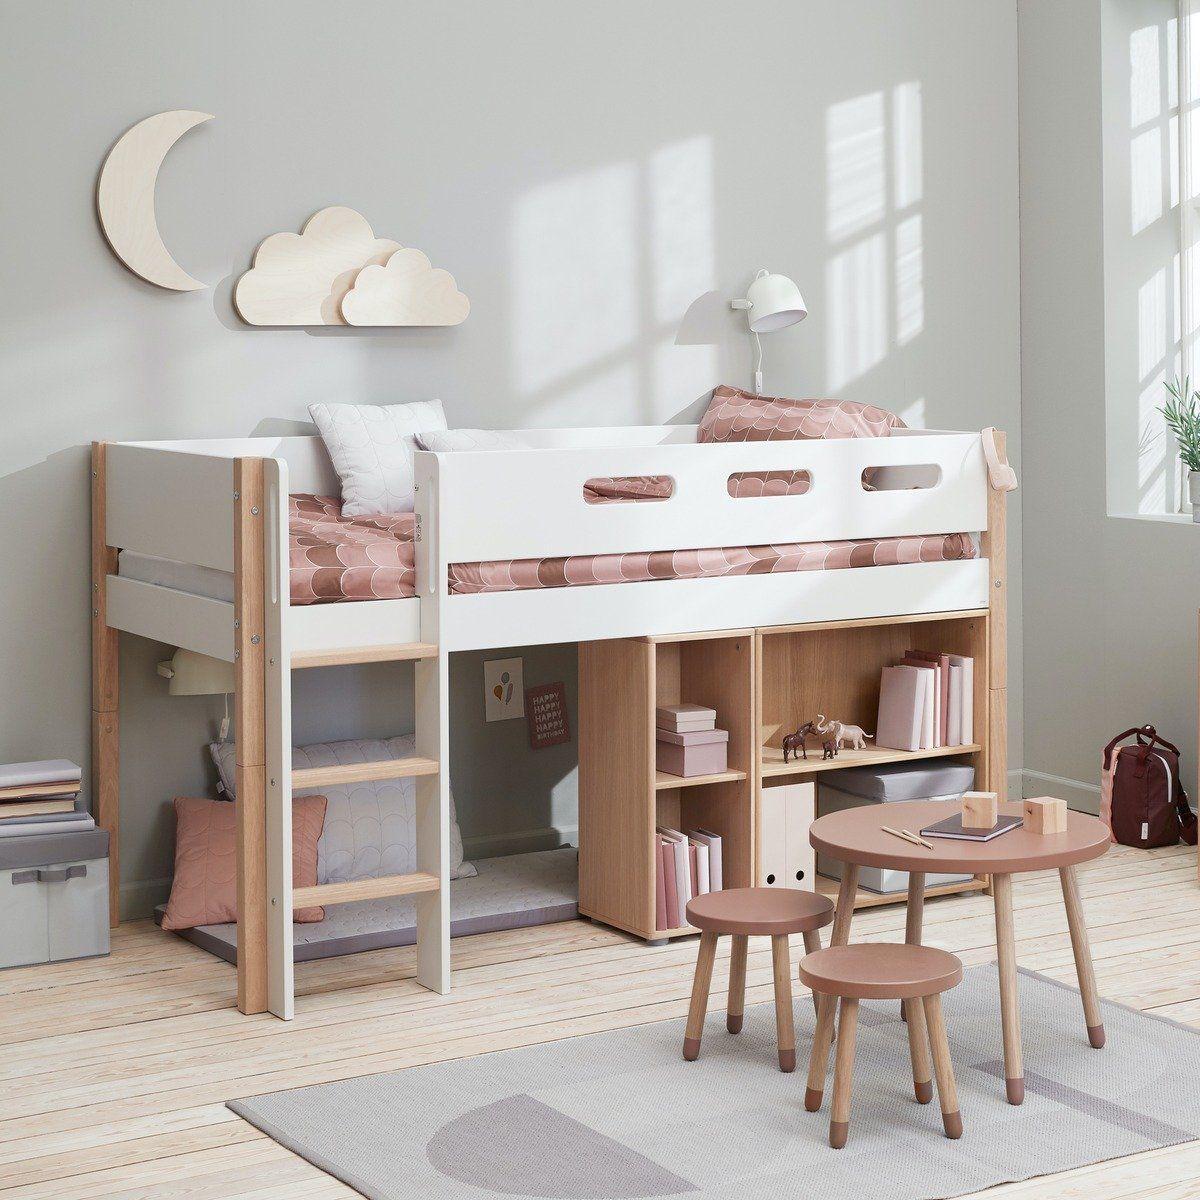 Flexa Nor Halbhohes Bett Mit Senkrechter Leiter Kidswoodlove In 2020 Bett Kinderzimmer Halbhohes Kinderbett Kinderzimmer Weiss